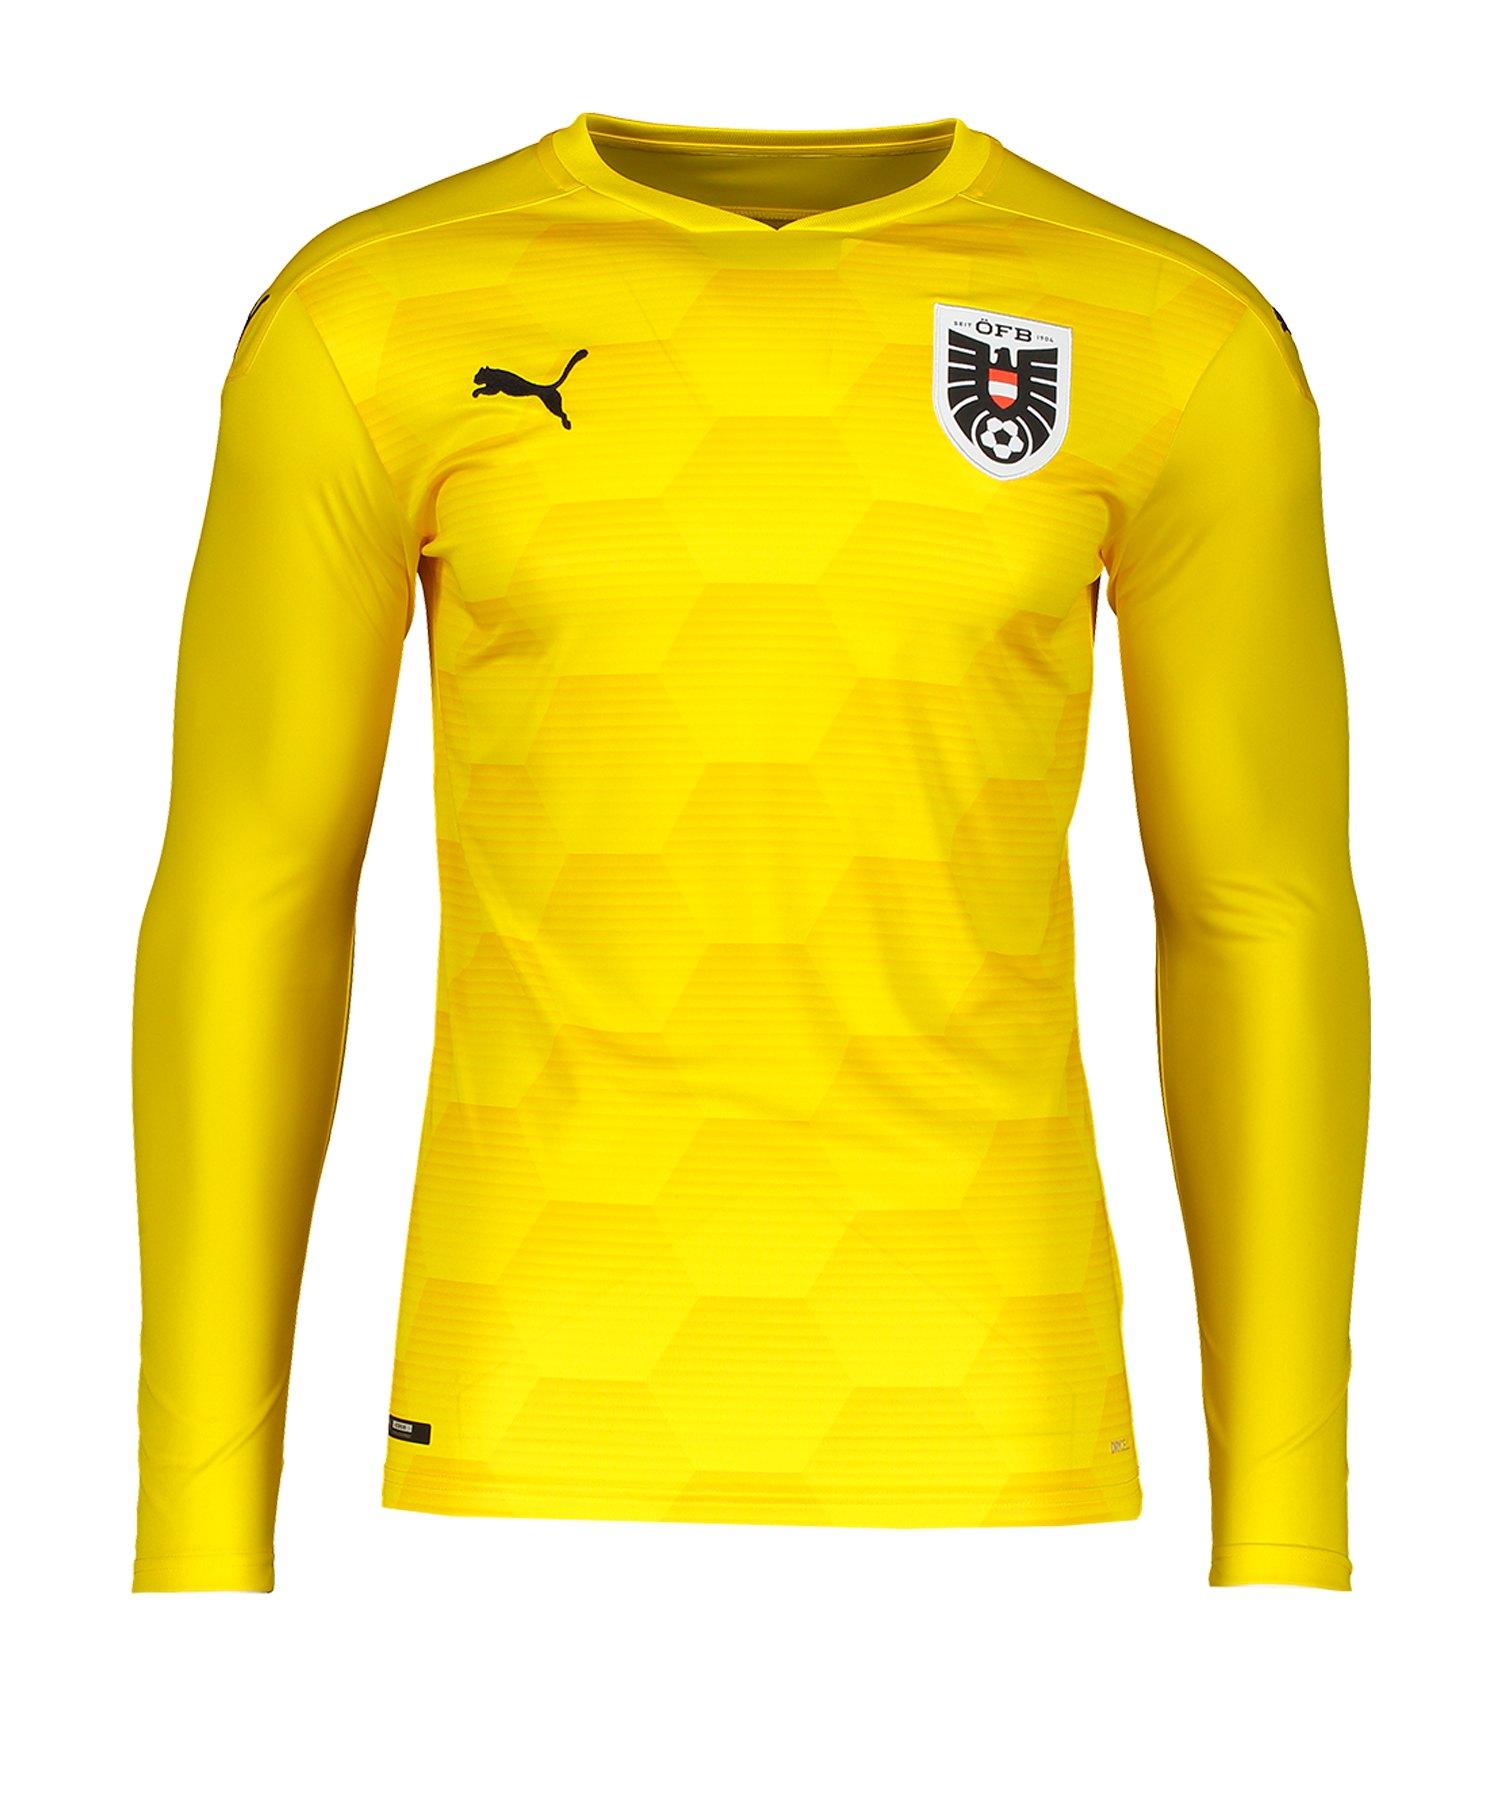 PUMA Österreich Torwarttrikot EM 2020 Gelb F06 - gelb